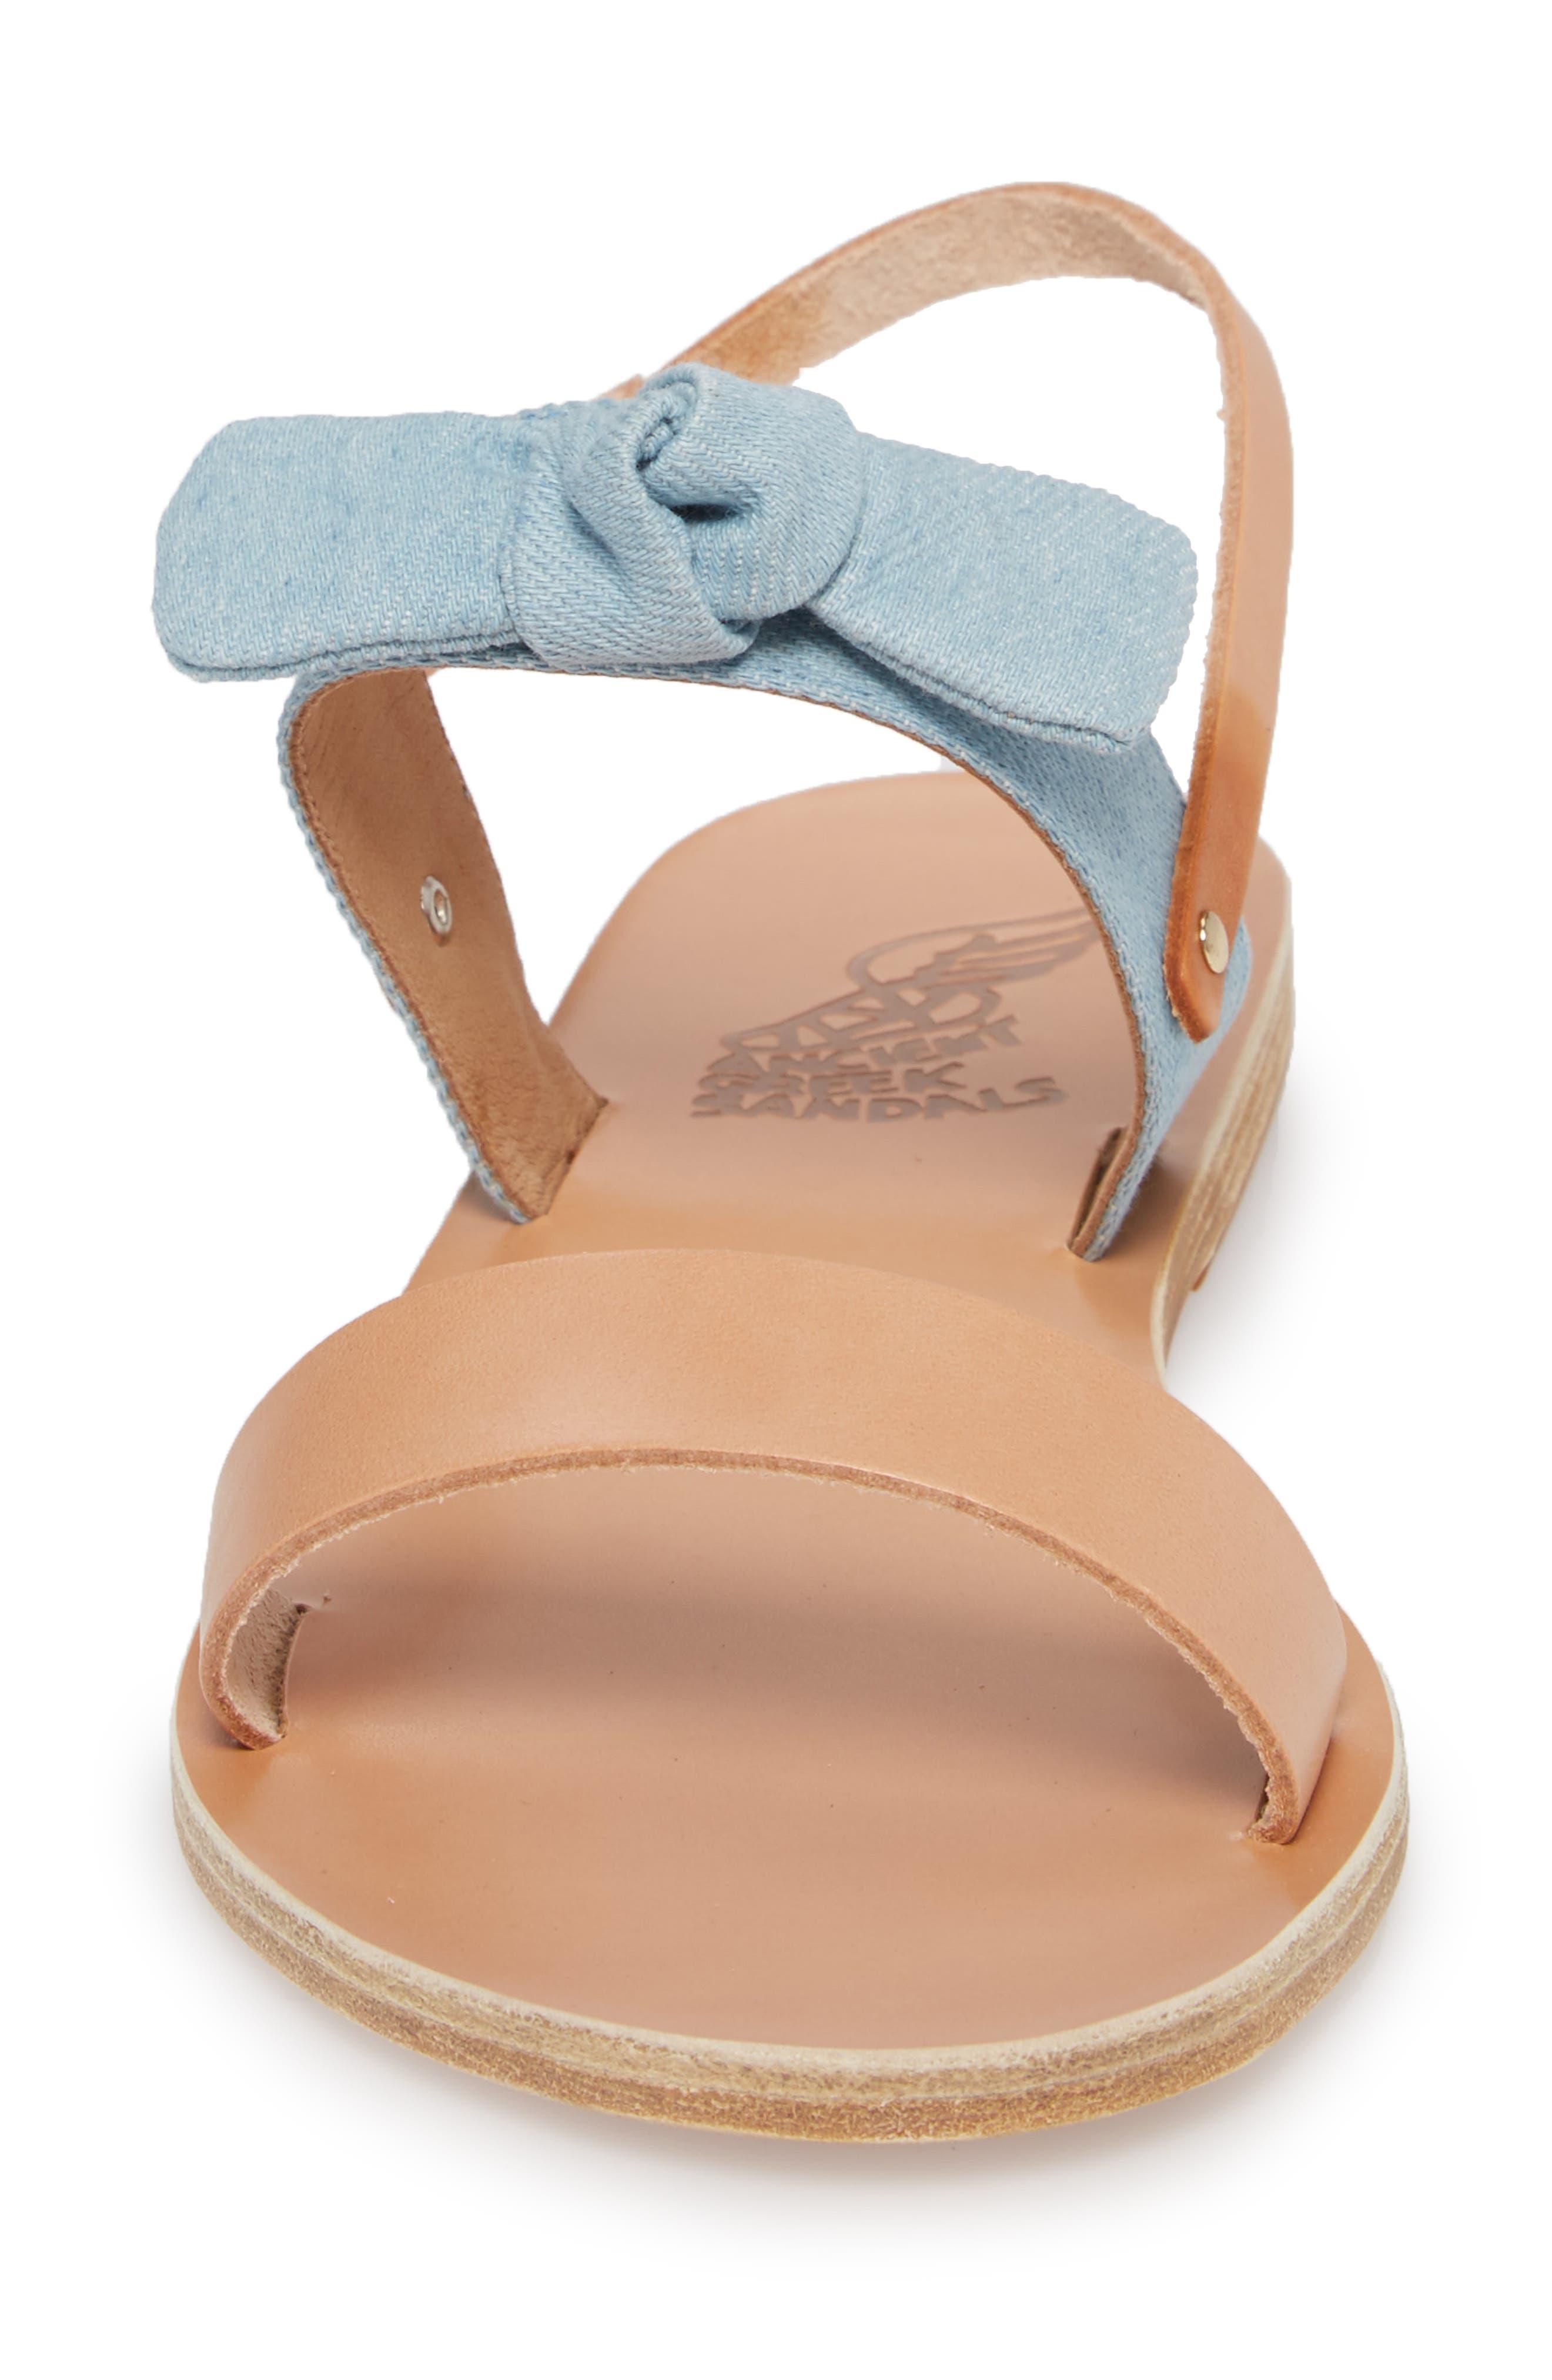 Clio Bow Sandal,                             Alternate thumbnail 4, color,                             400